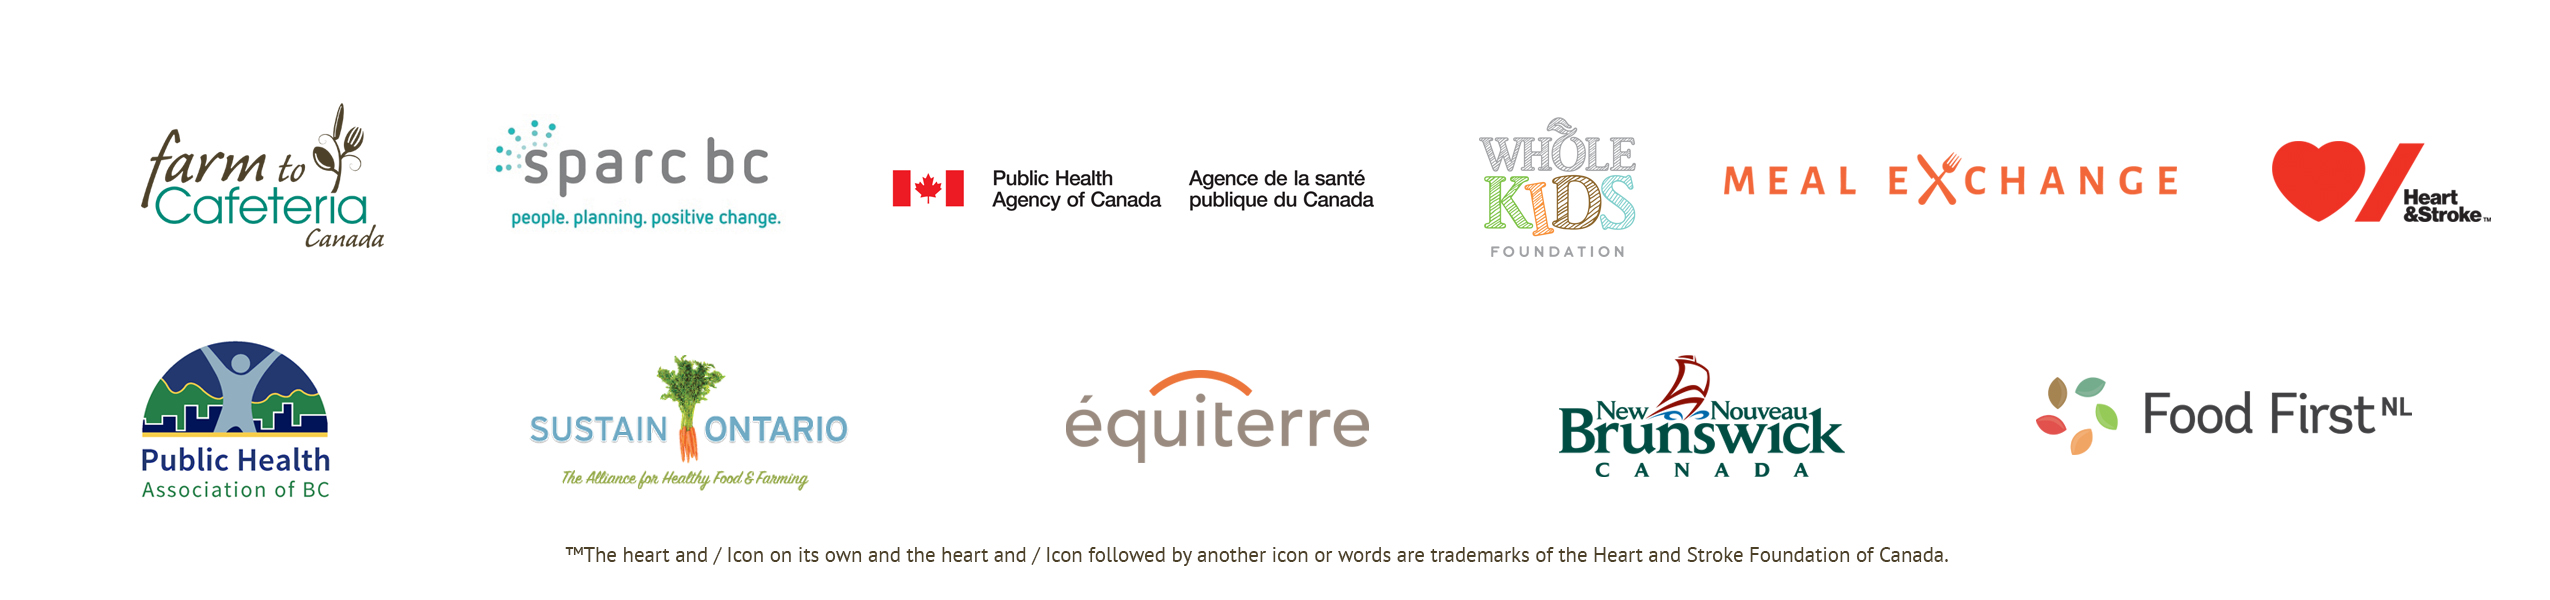 CDI partner logos